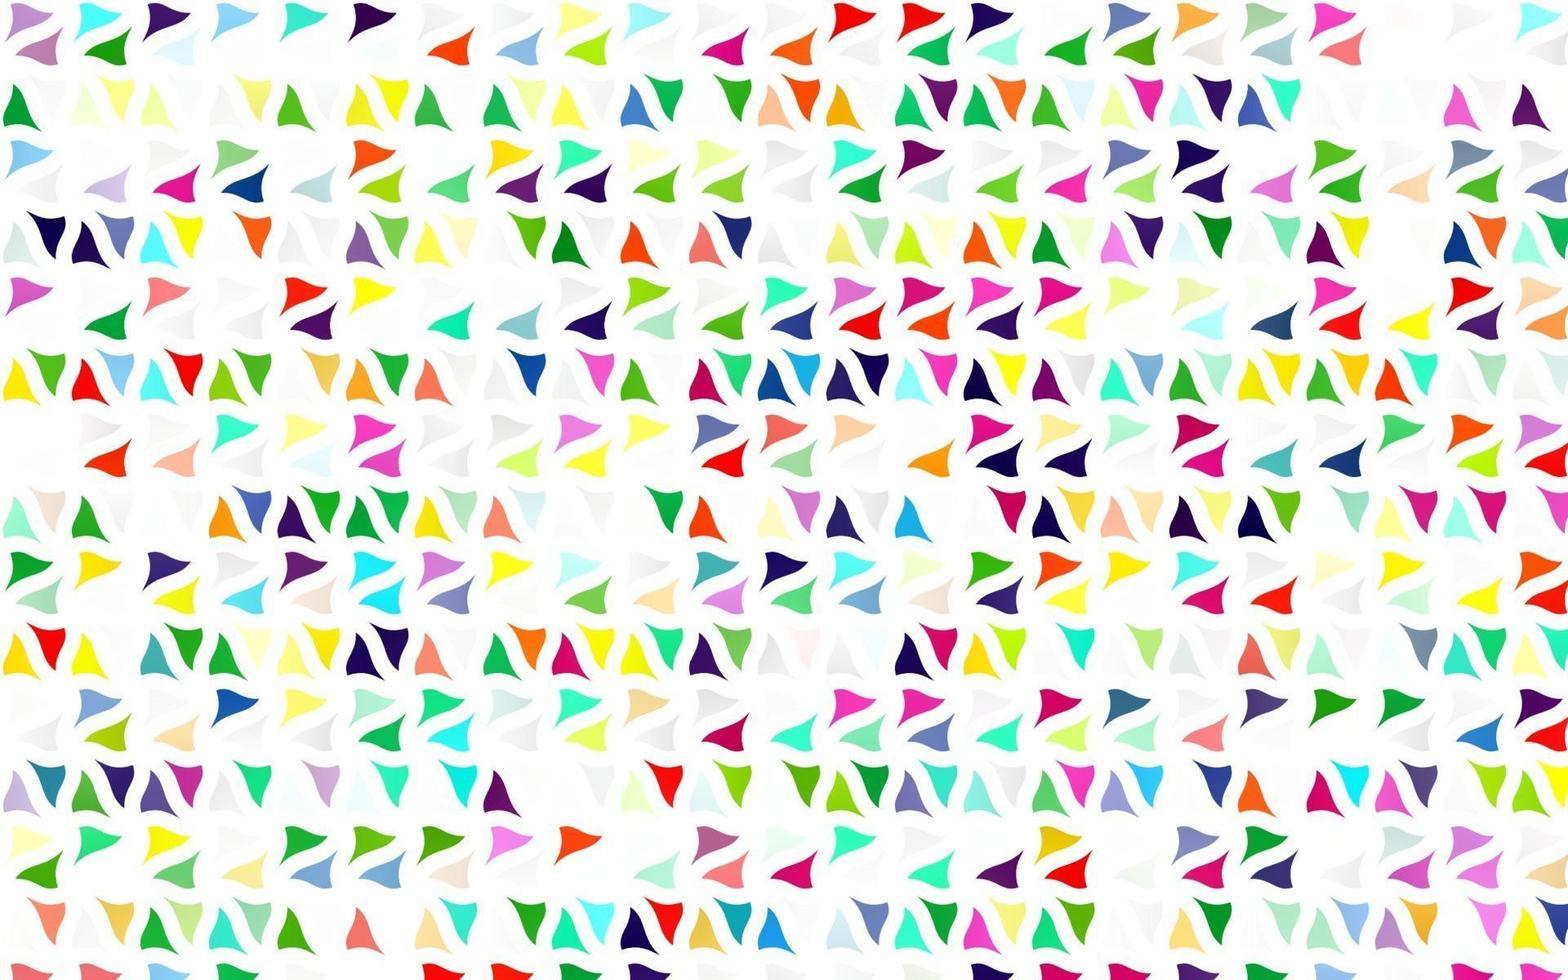 luz multicolorida, capa de vetor de arco-íris em estilo poligonal.